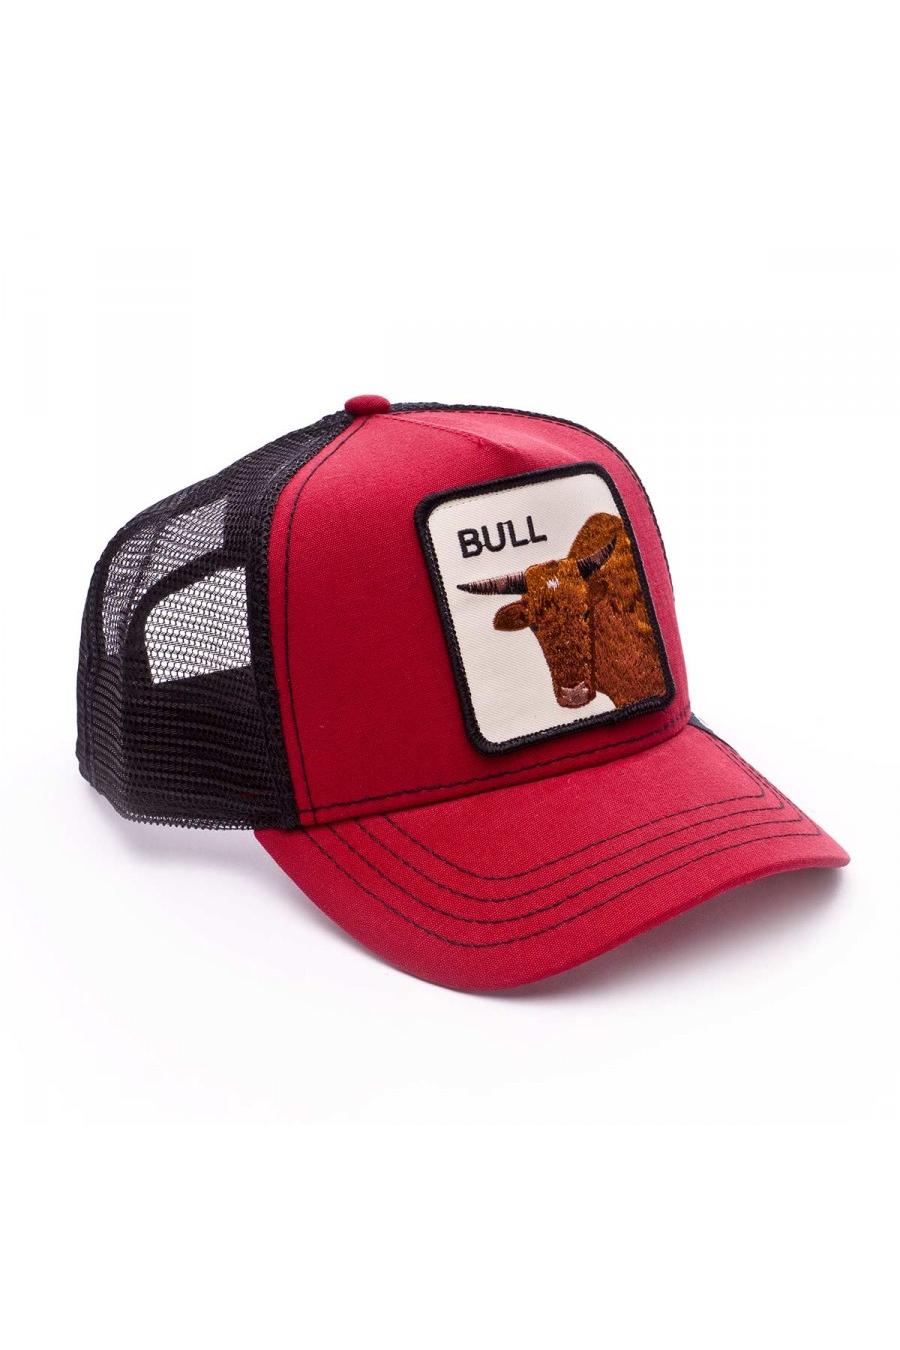 970dcfff Goorin Bros Goorin Bros Boğa Figürlü Bull Şapka - Less is More